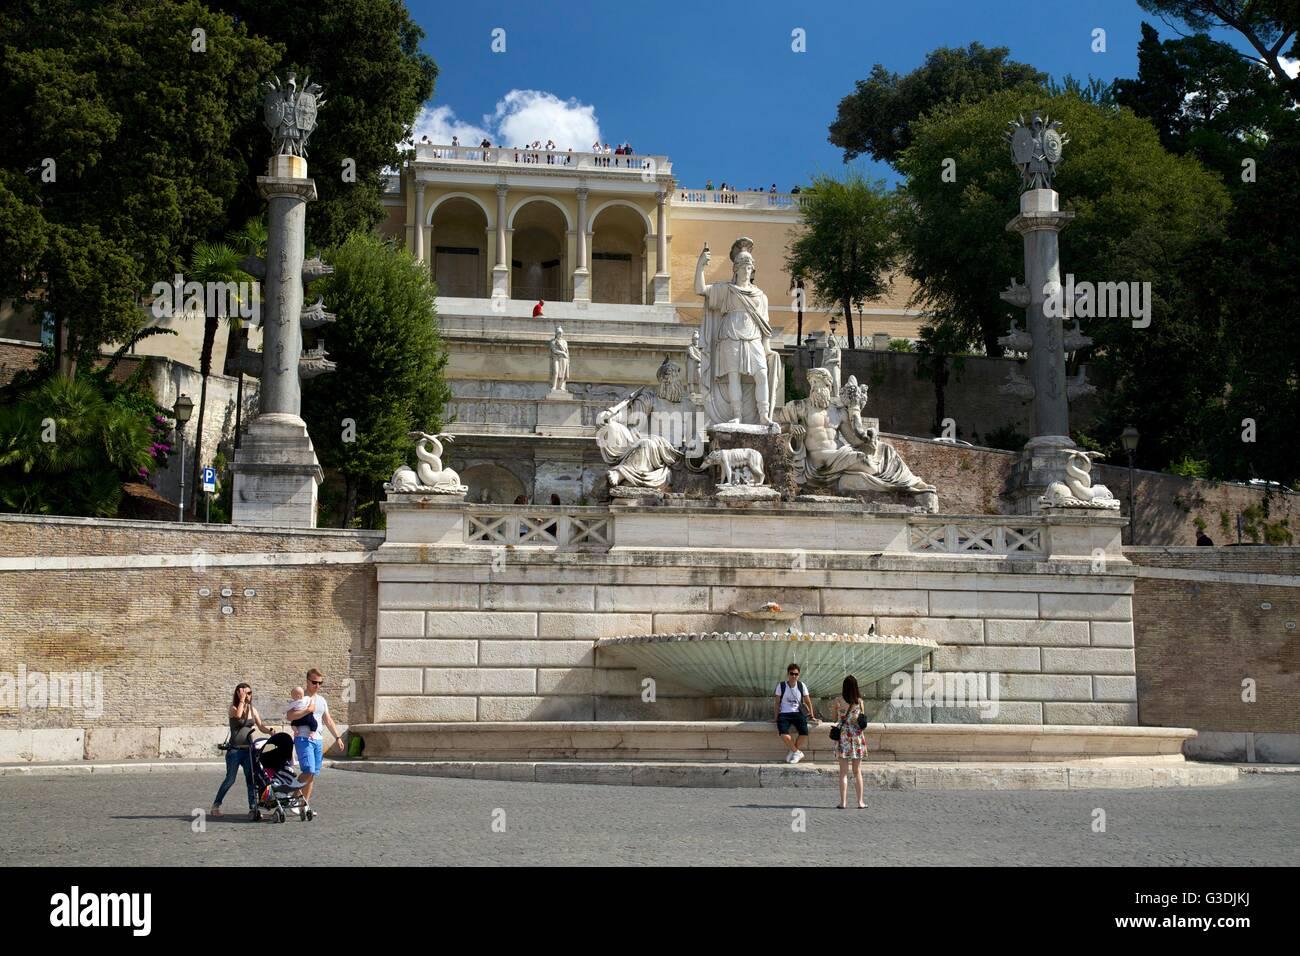 Pincio Terrace with statues of the Goddess Roma between Tiber and Aniene, Piazza del Popolo, Rome, Lazio, Italy, - Stock Image